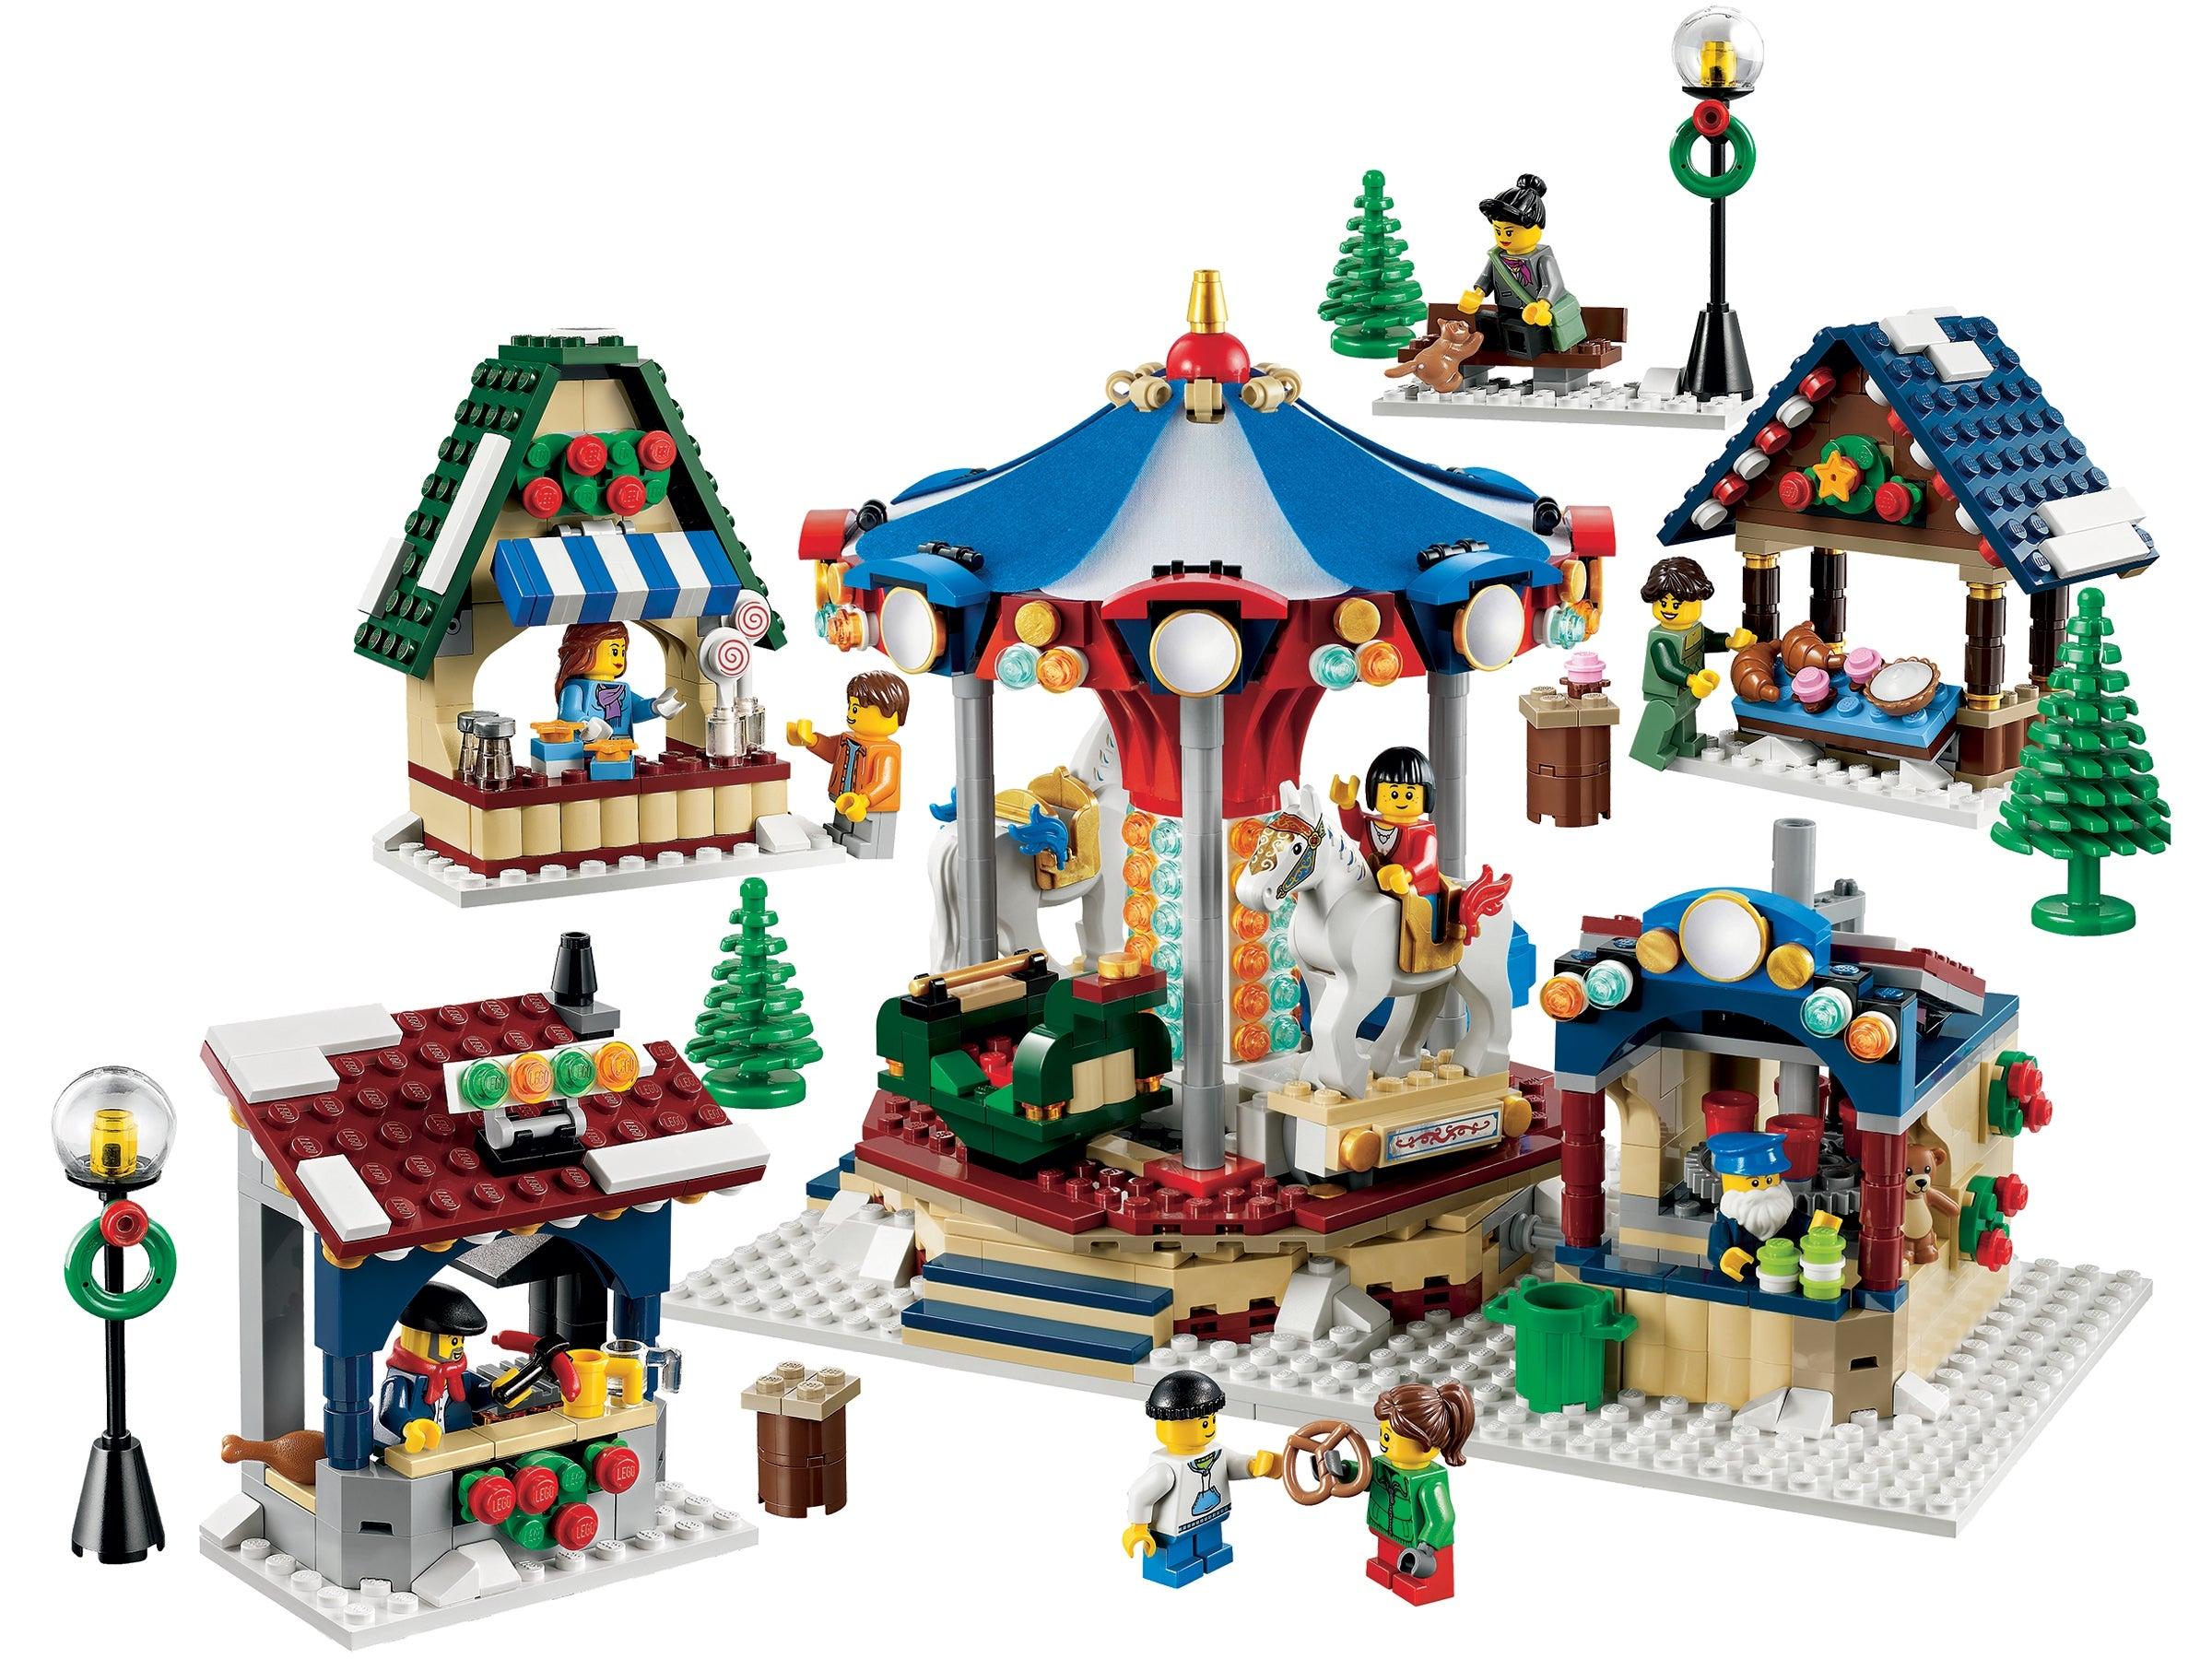 NEW SEALED RETIRED ***SHIPS GLOBAL* LEGO 10235 WINTER VILLAGE MARKET CAROUSEL